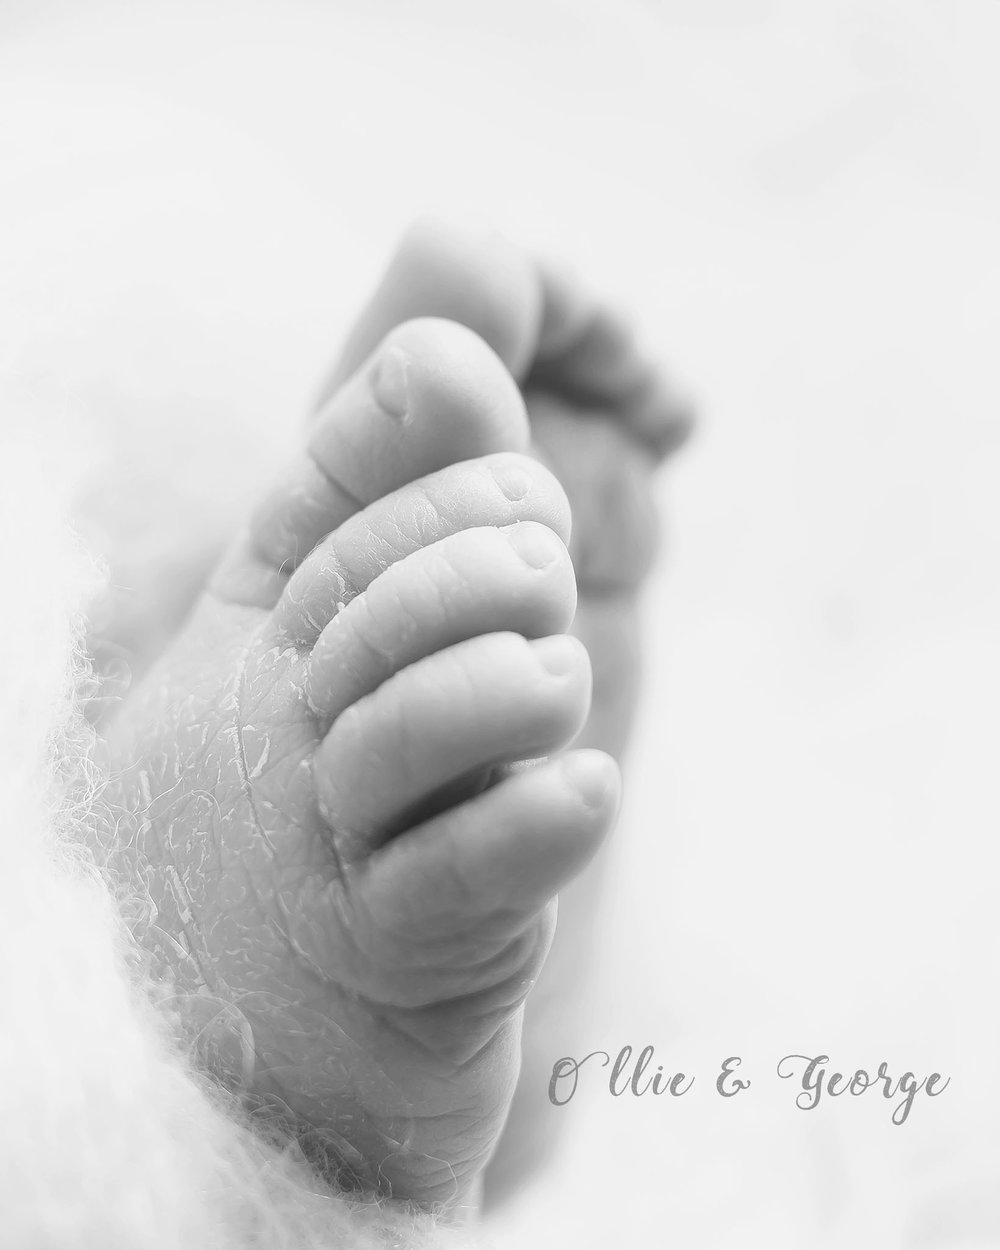 Clitheroe newborn baby photo shoot, professional photography studio in Ribble Valley Lancashire nr Blackburn, Accrington, Burnley, Whalley, Pendle